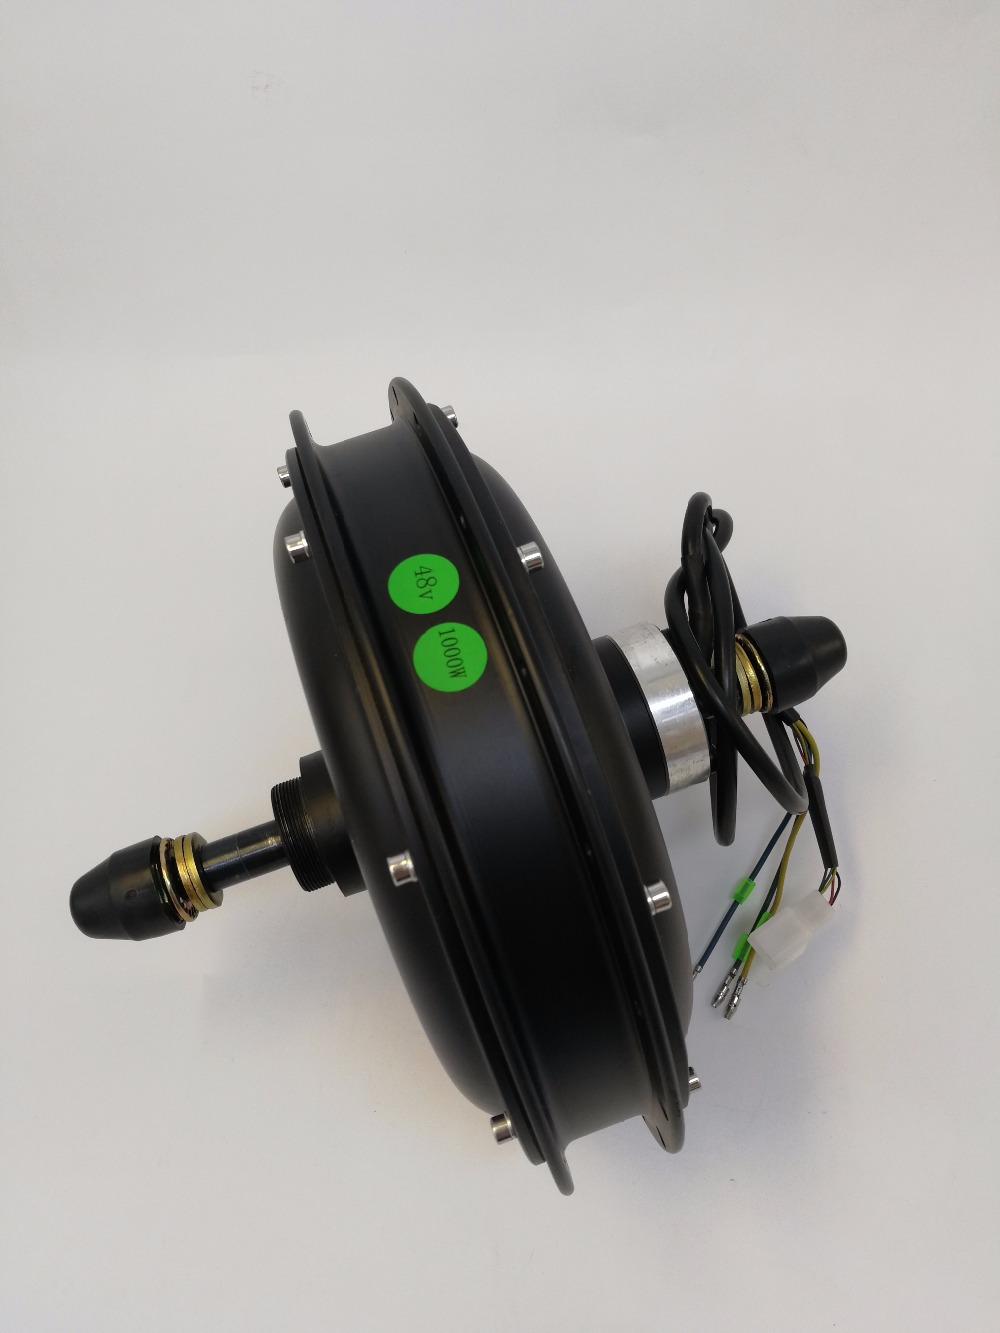 EVFITTING E-bike Fatbike Motor 48Volt 1000W Brushless DC Hub Motor For Rear Wheel Fatbike 170mm Dropout